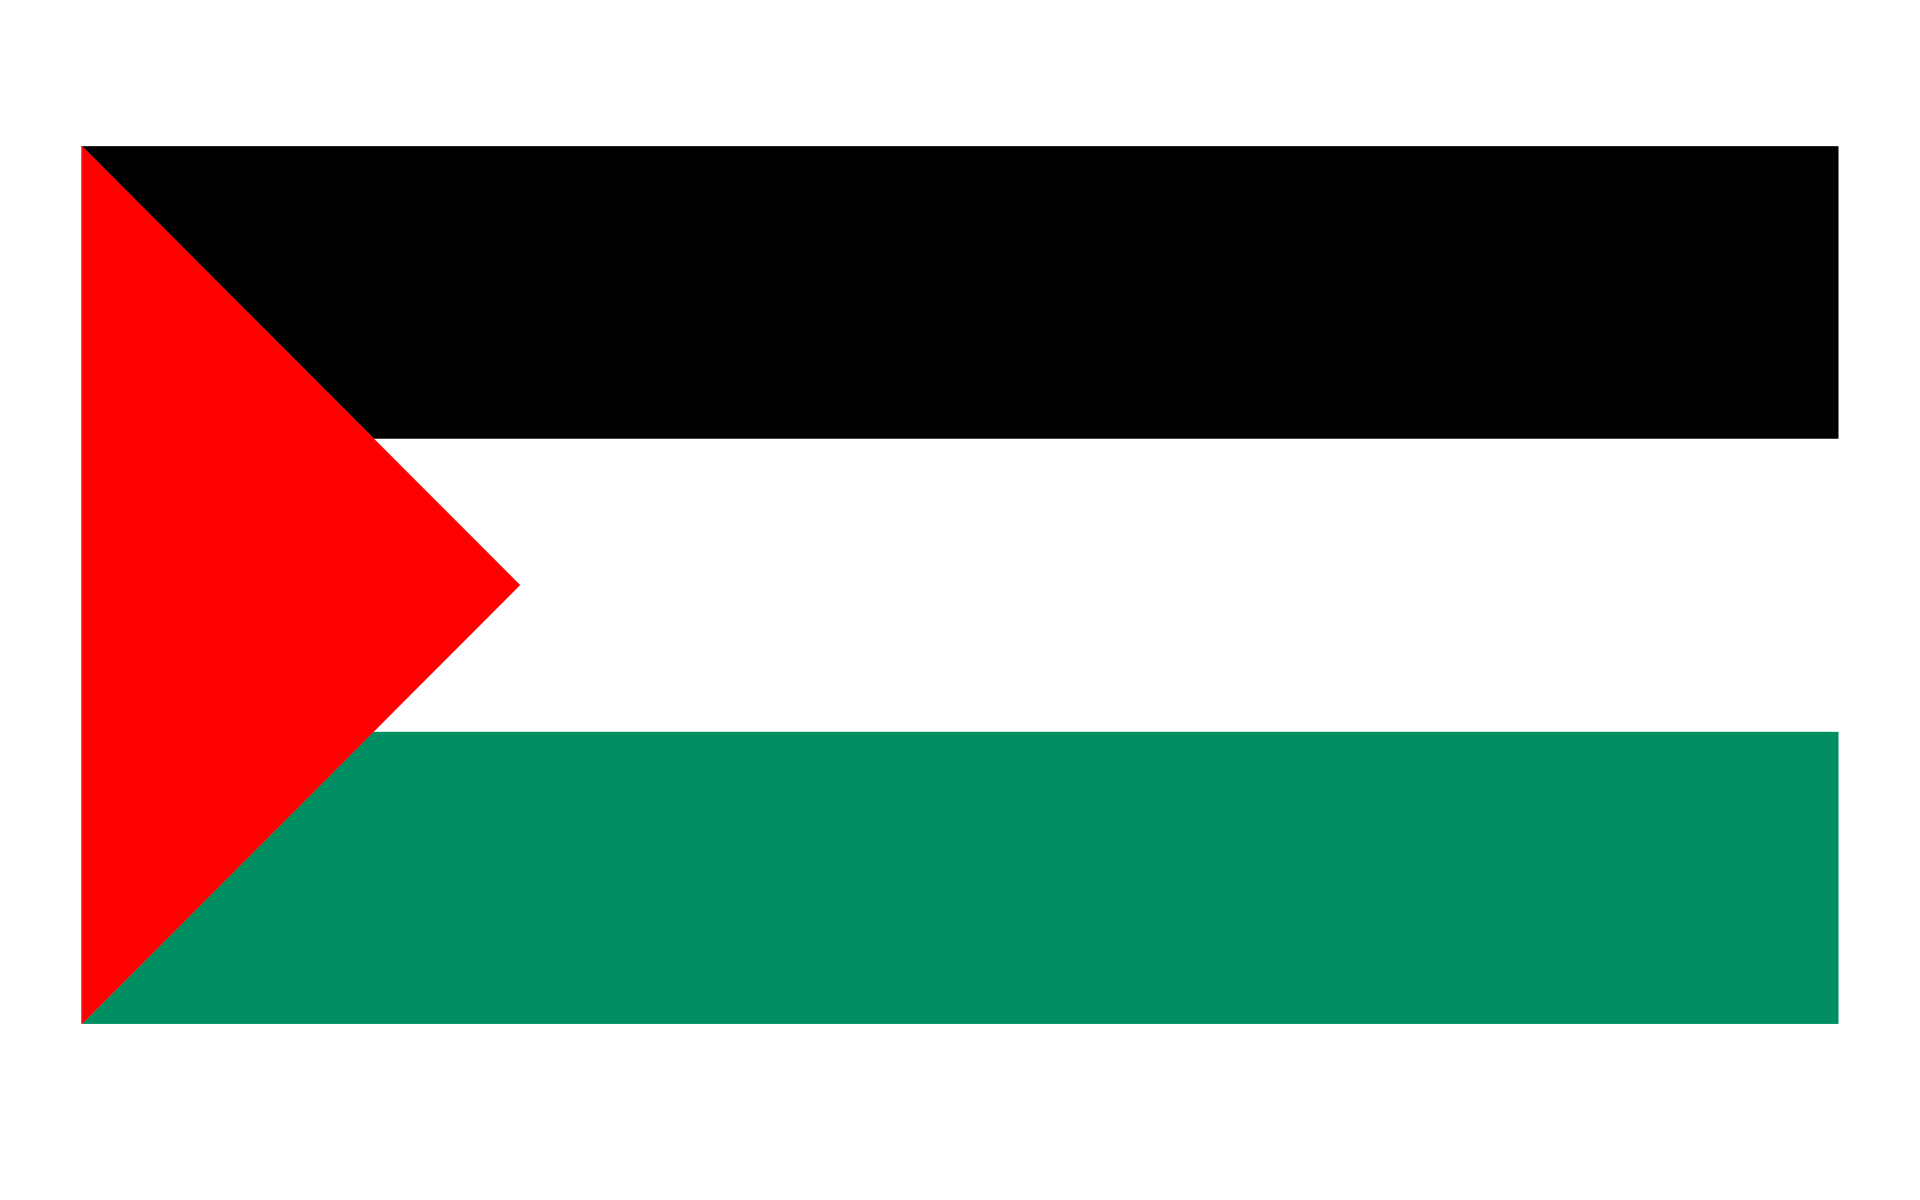 Palestine Flag Png image #38276